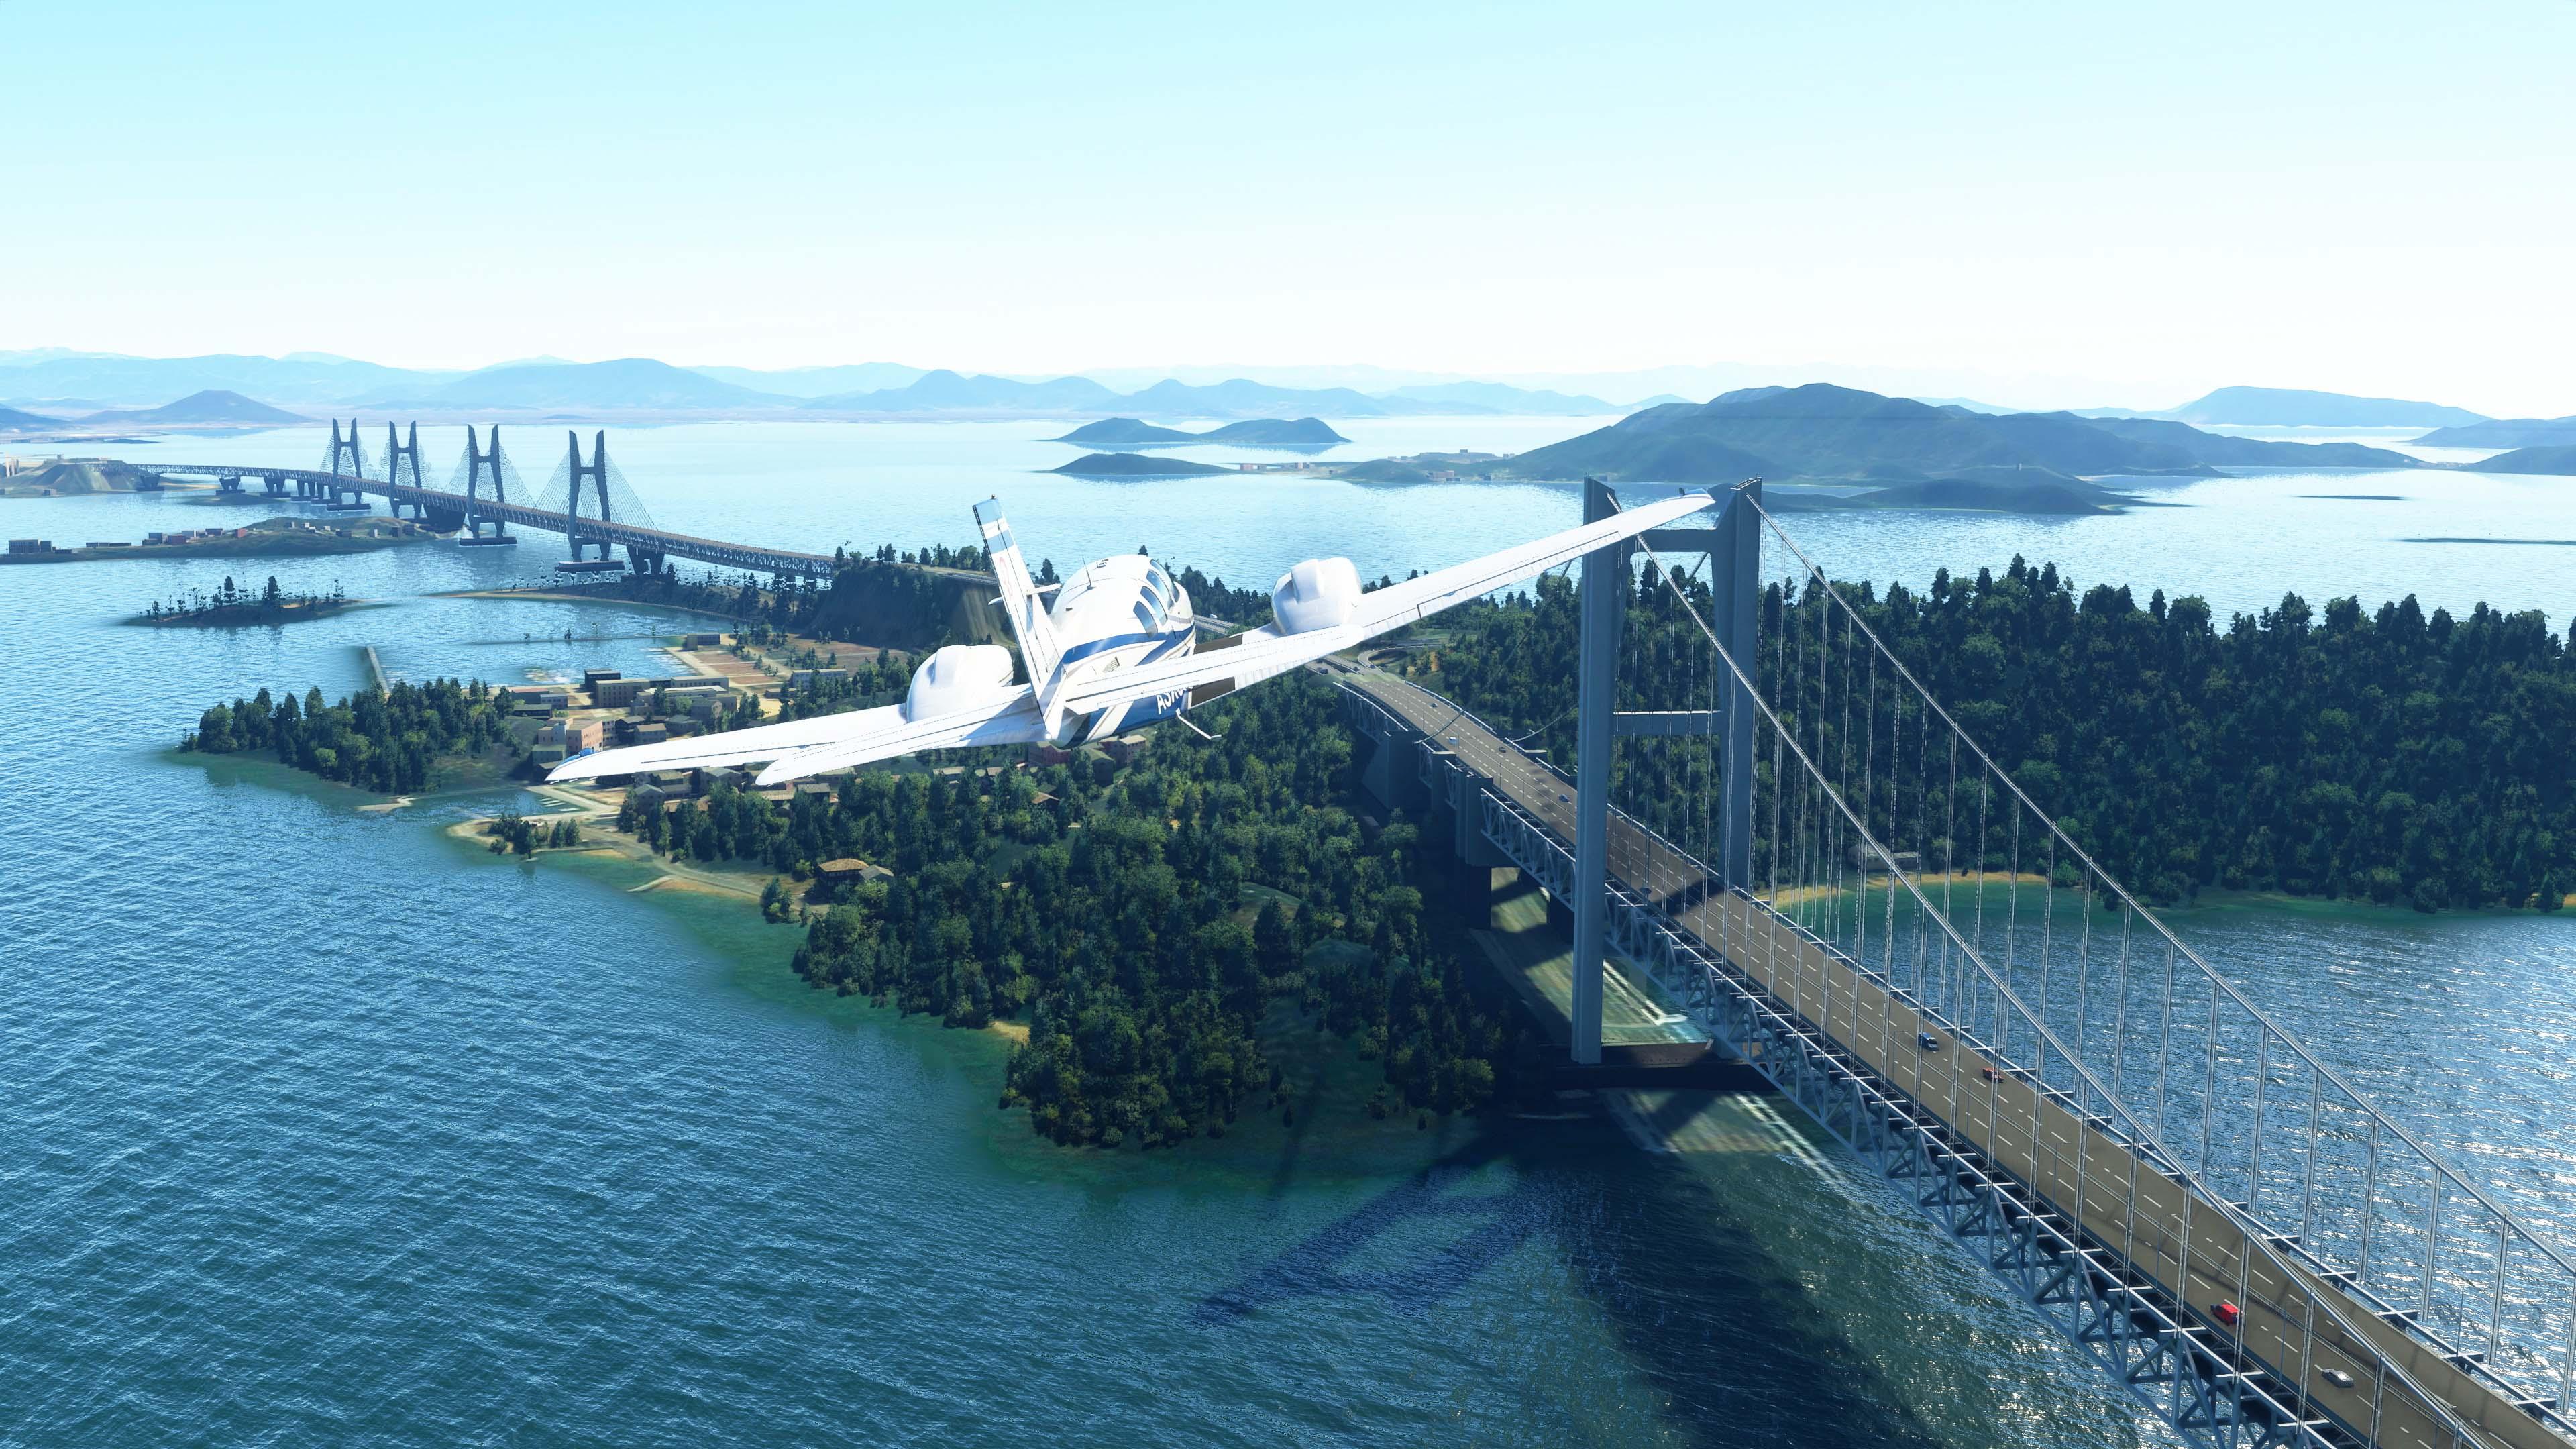 Photo of [TGS 2020]「Microsoft Flight Simulator」の無料アップデート第1弾「World Update I:Japan」を発表した。日本に焦点を当てた目標を制作者に尋ねた